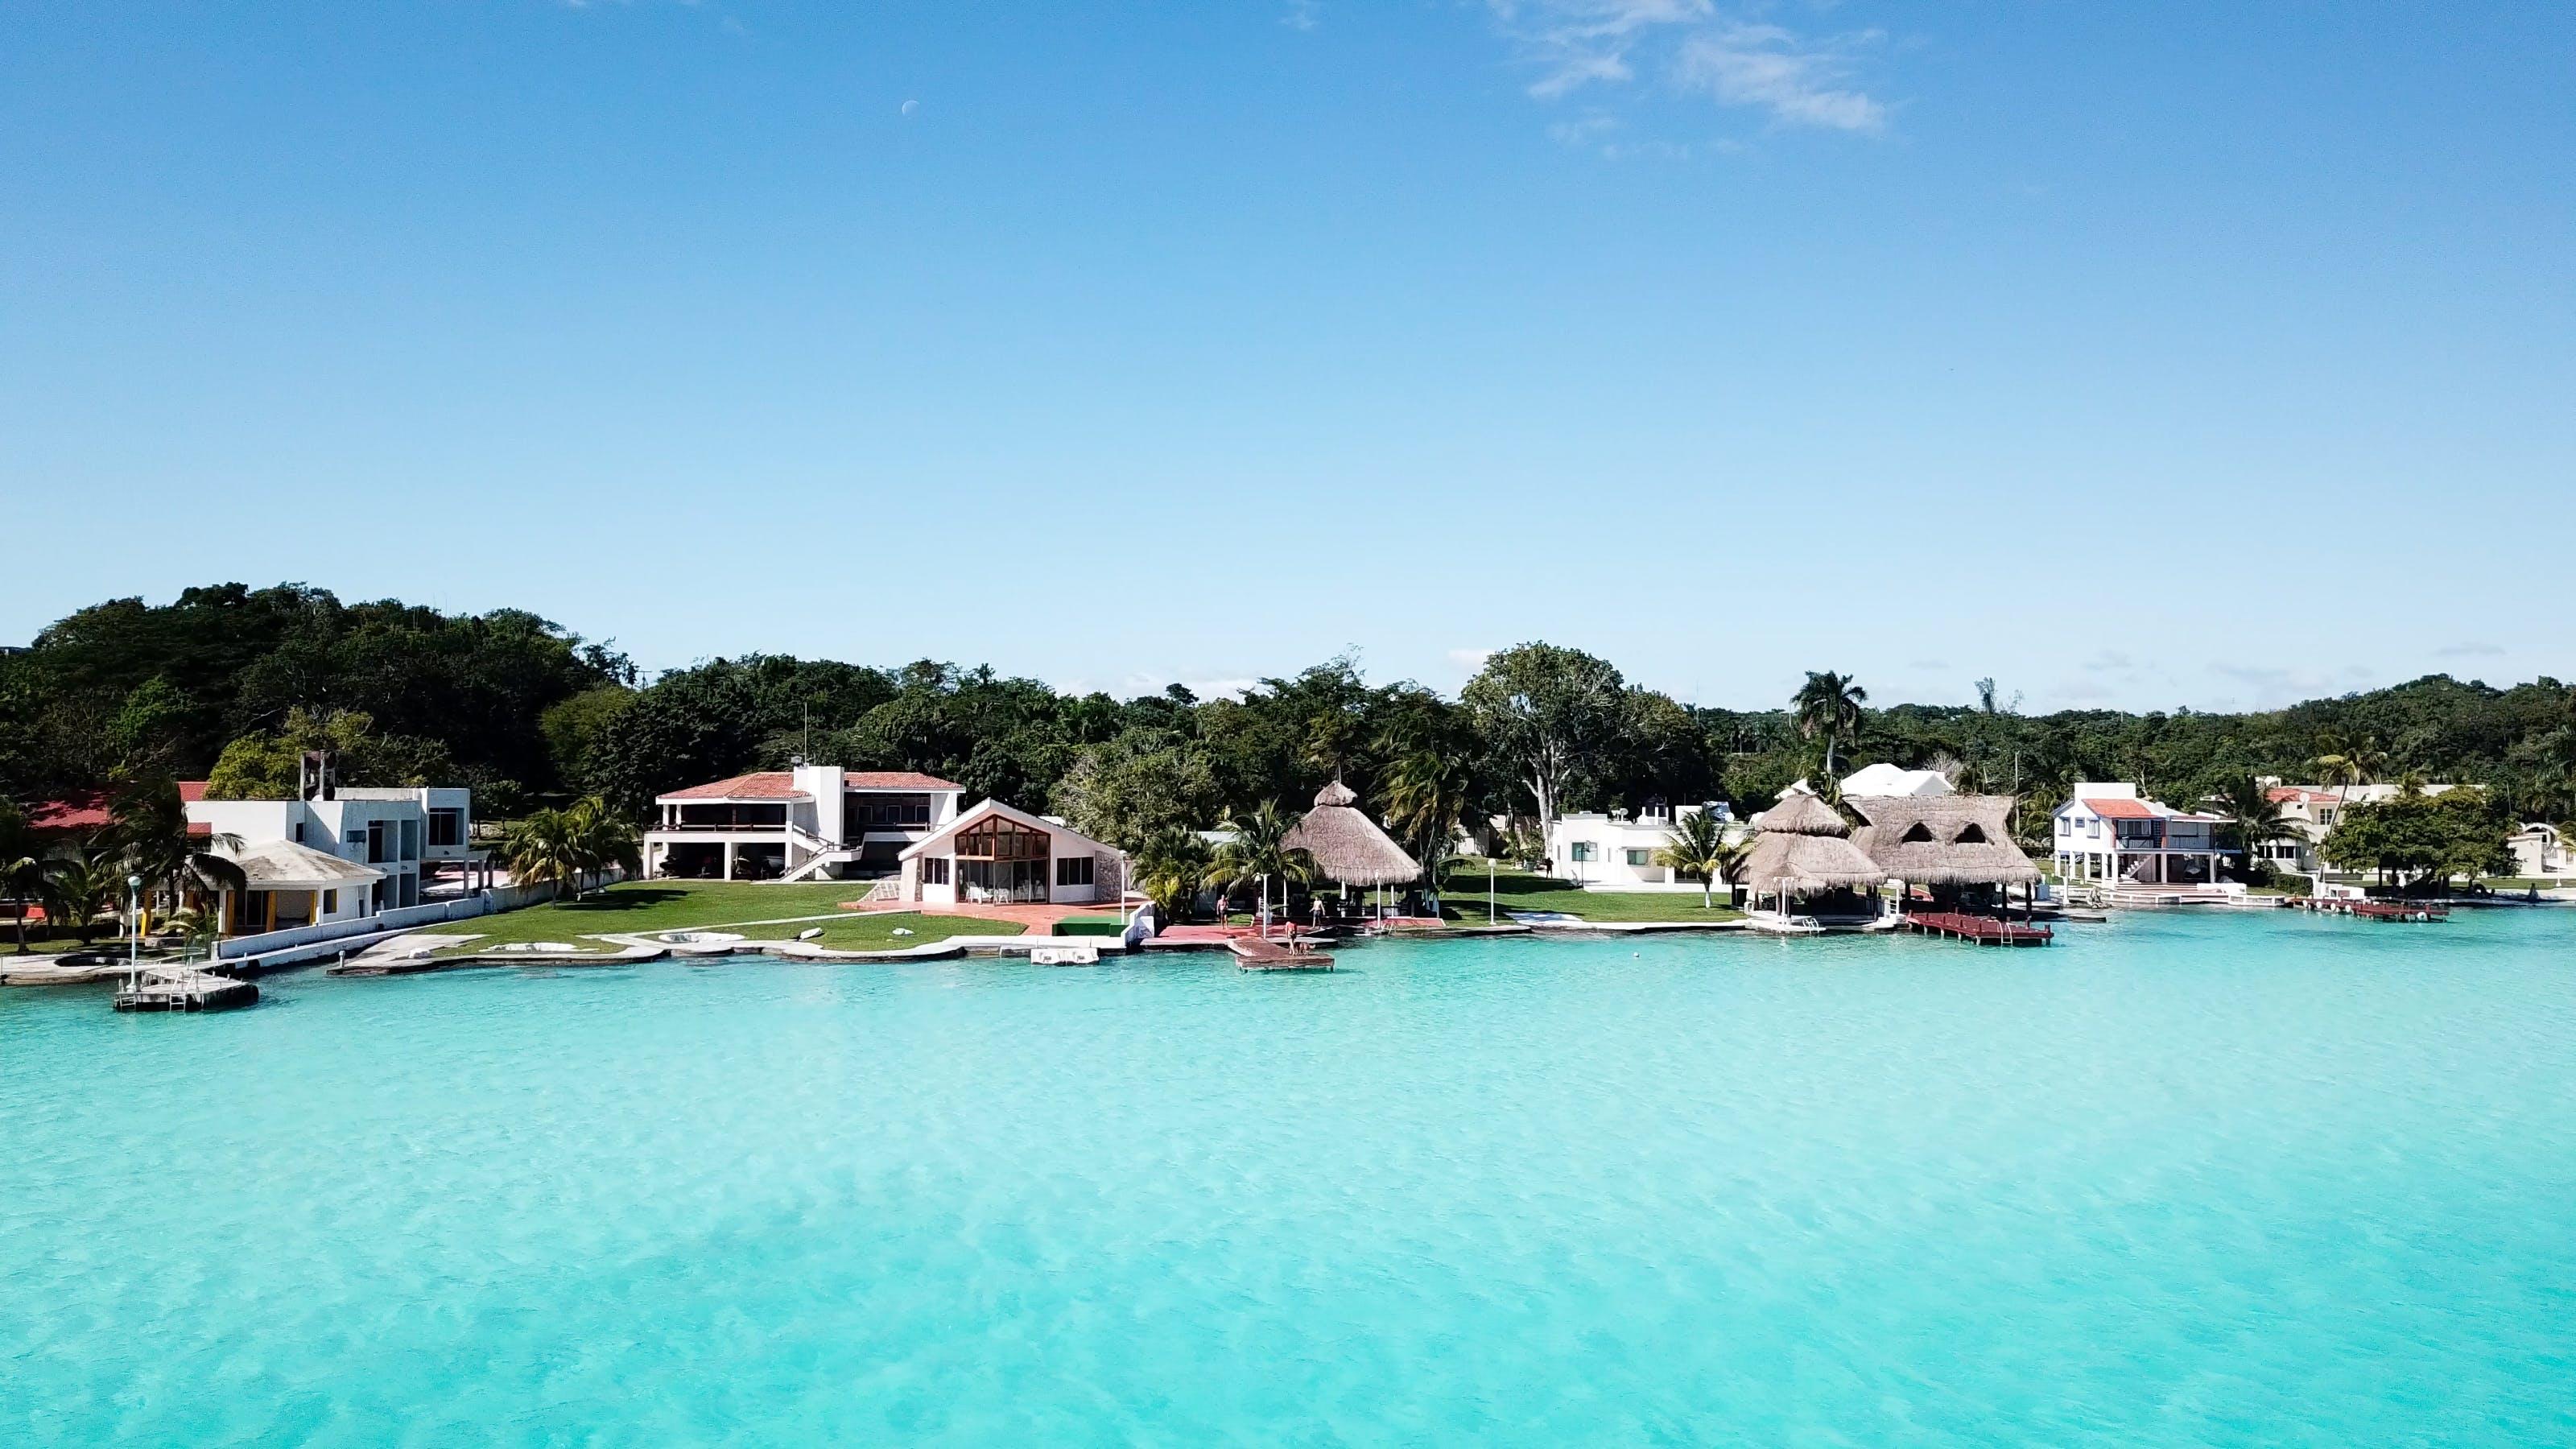 Free stock photo of blue lagoon, broker, Invest properties, playa del carmen